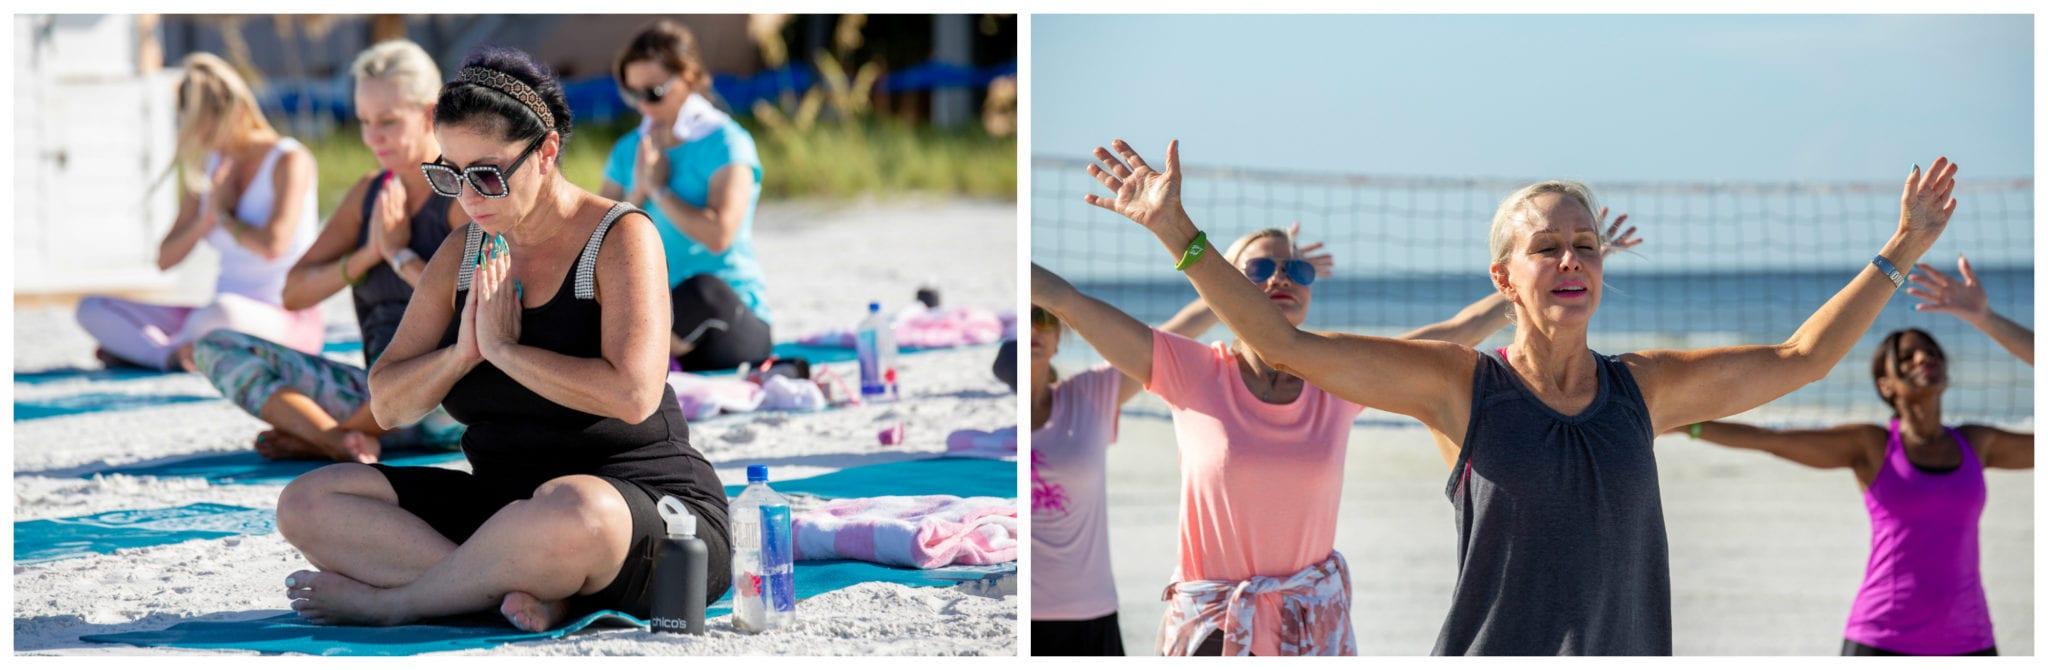 Chico's event, yoga, beach yoga, Pink Shell Resort, Sand,